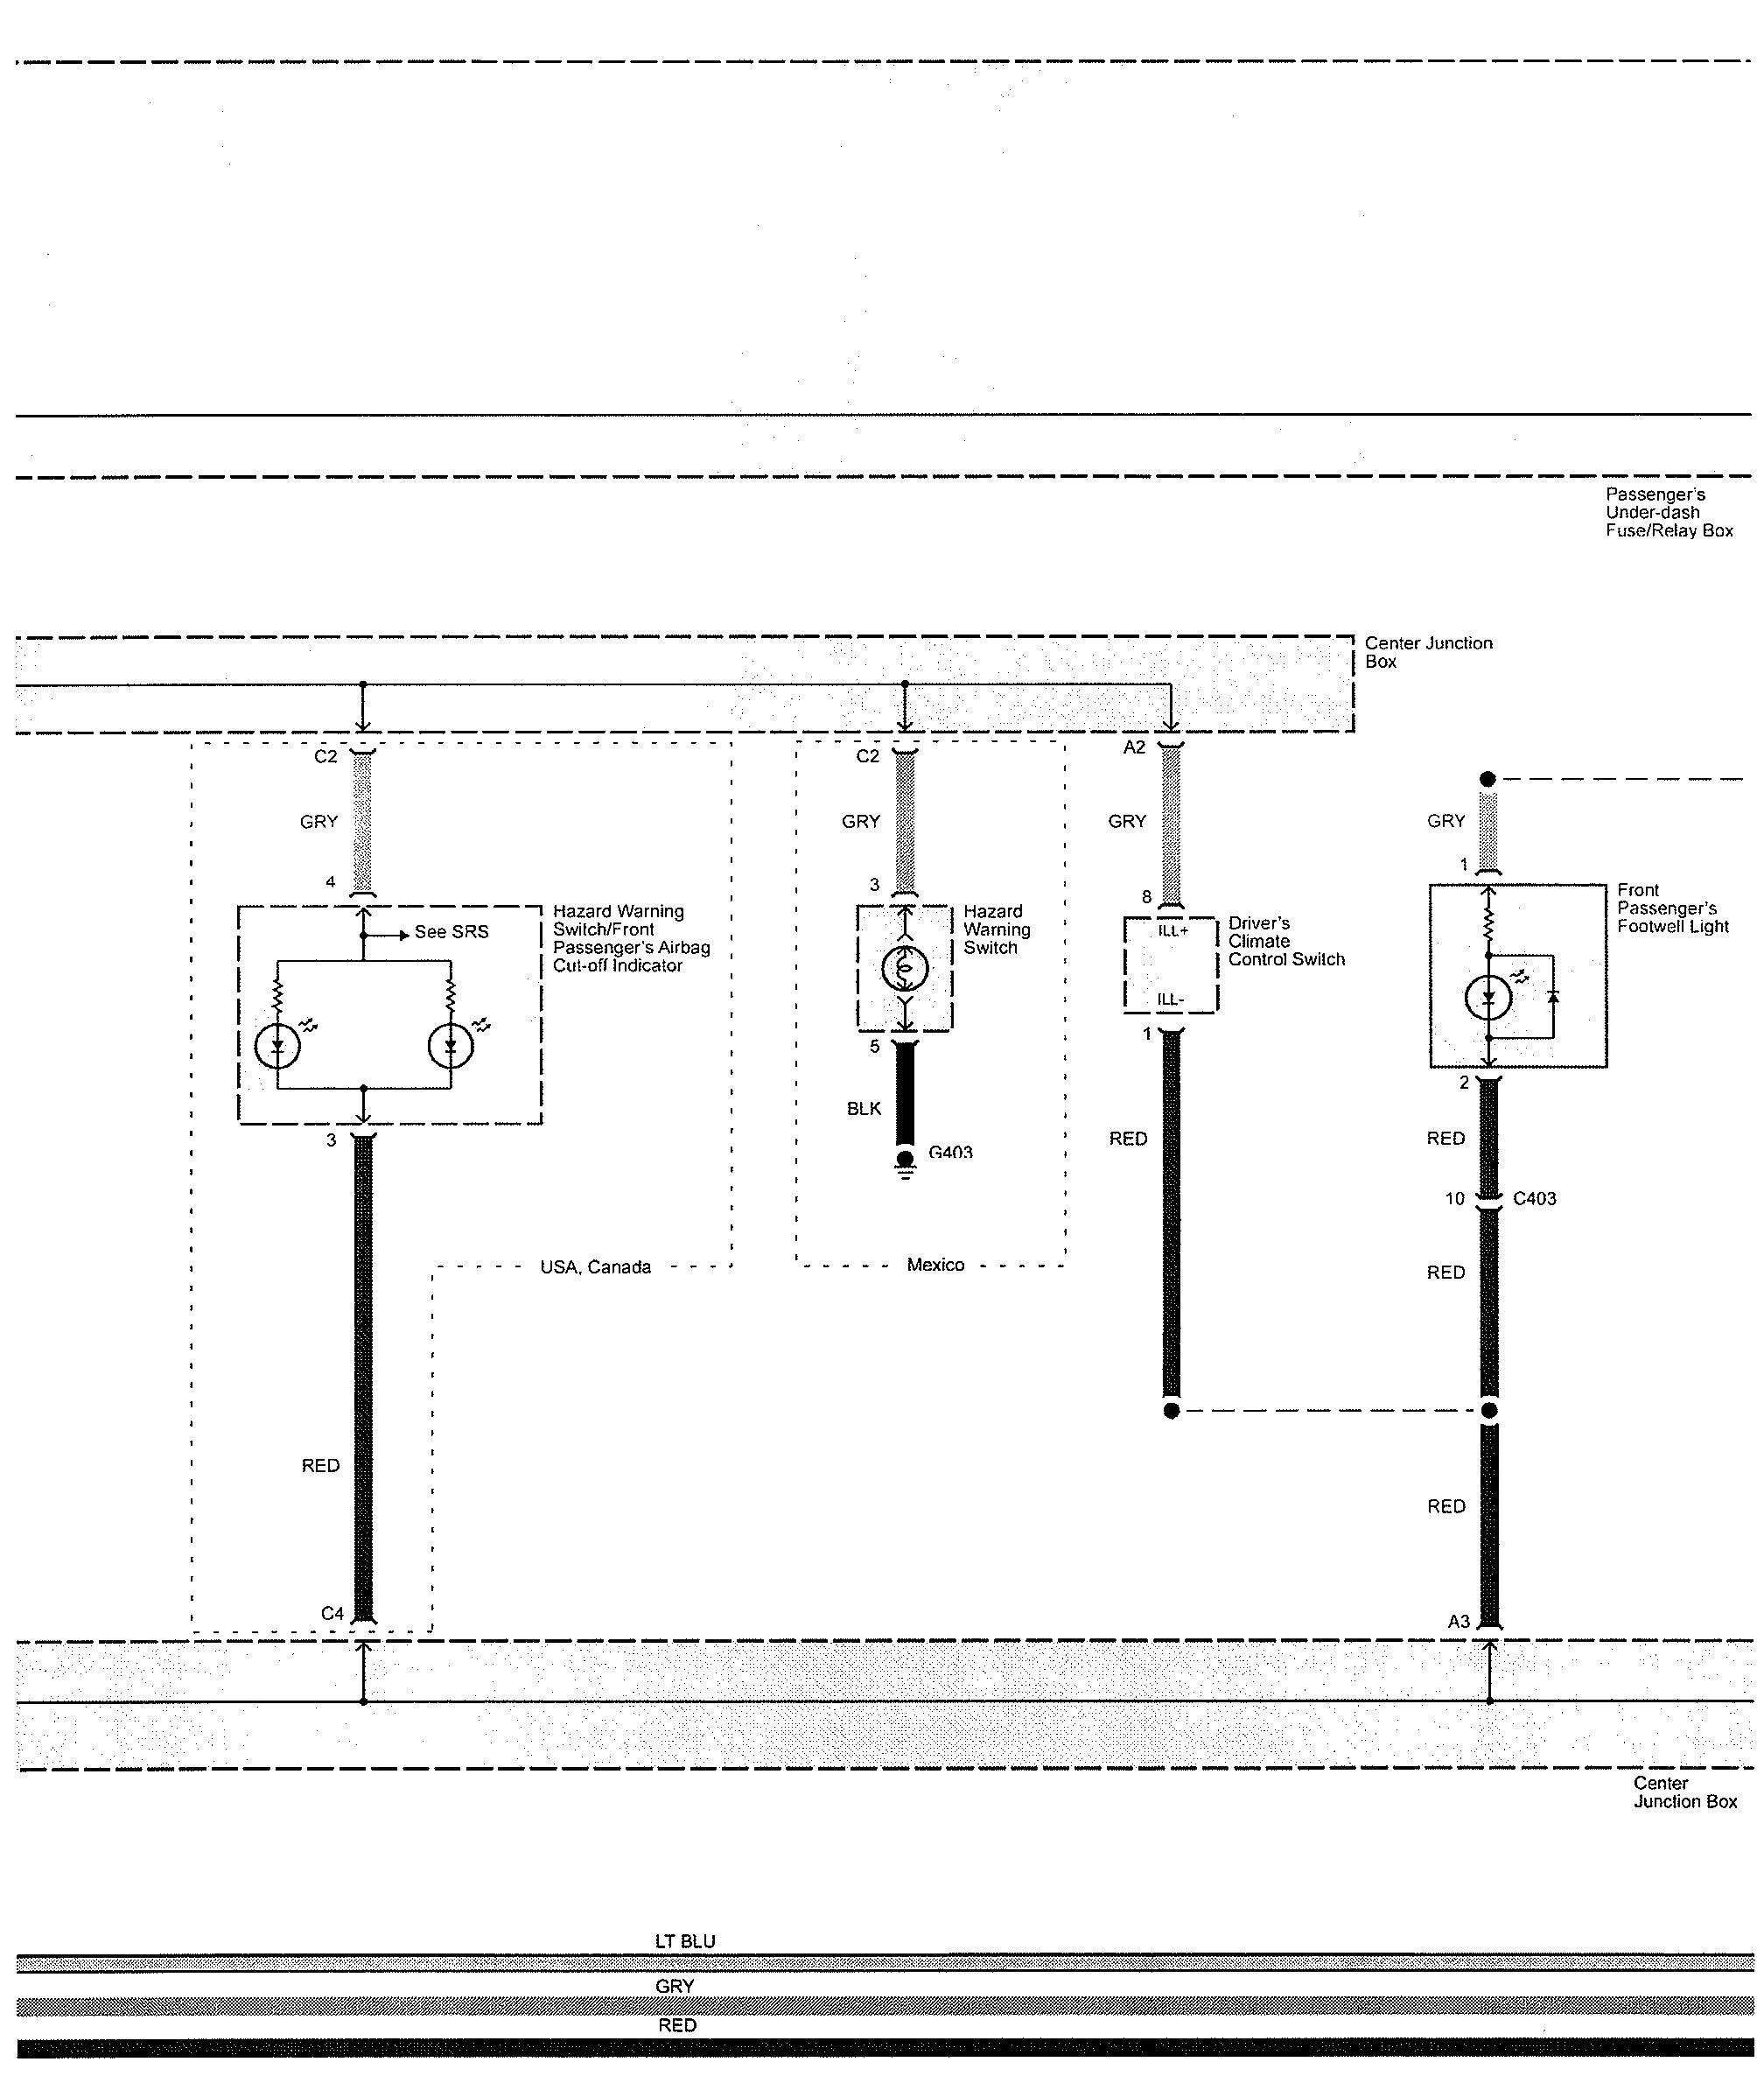 Interior Light Wiring Diagram : Acura tl wiring diagrams interior lighting